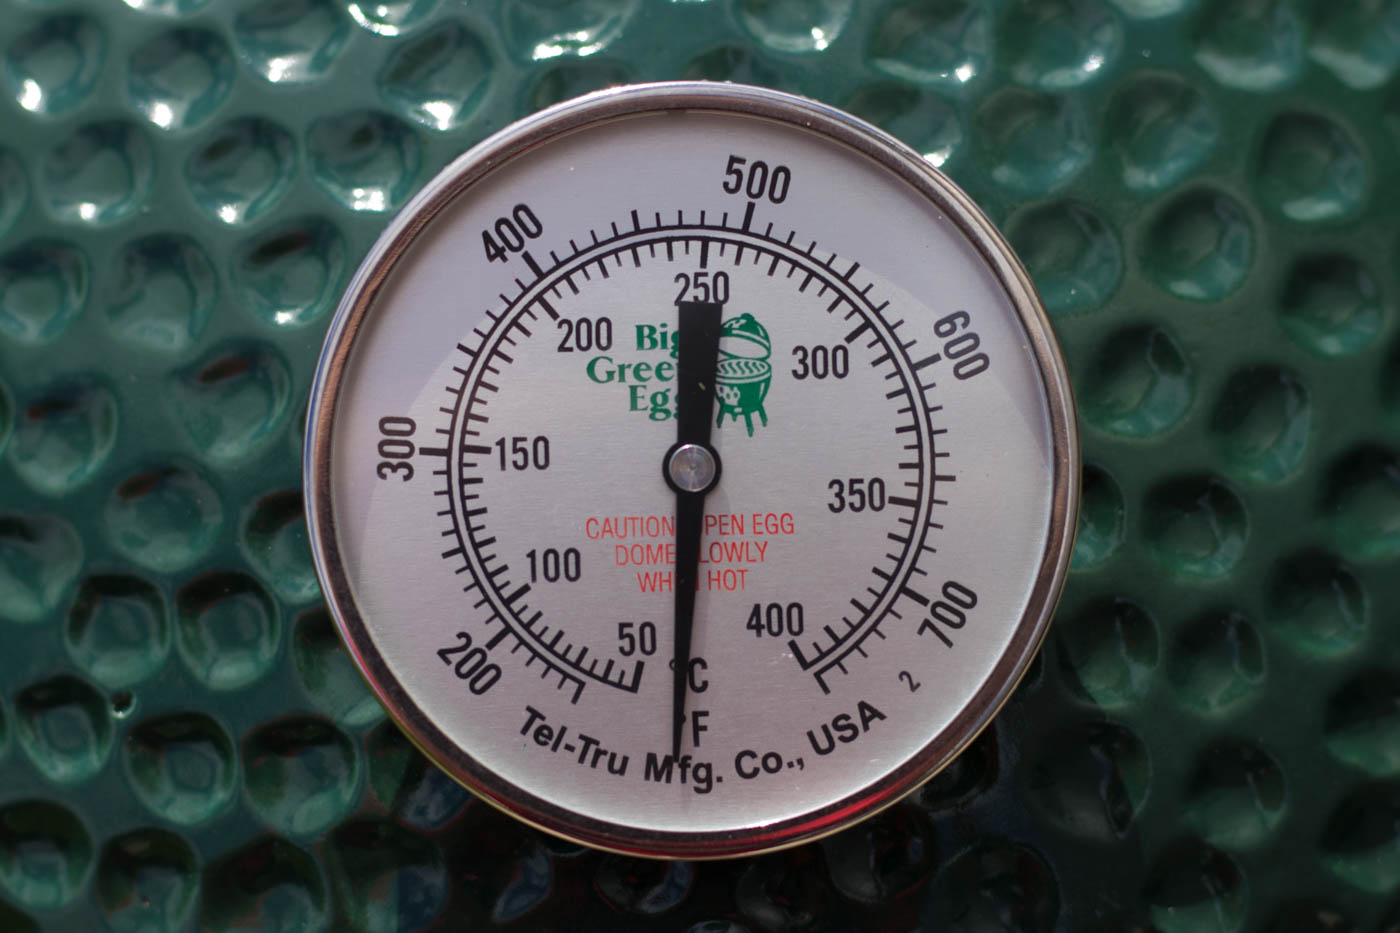 Das neue Tel Tru Thermometer